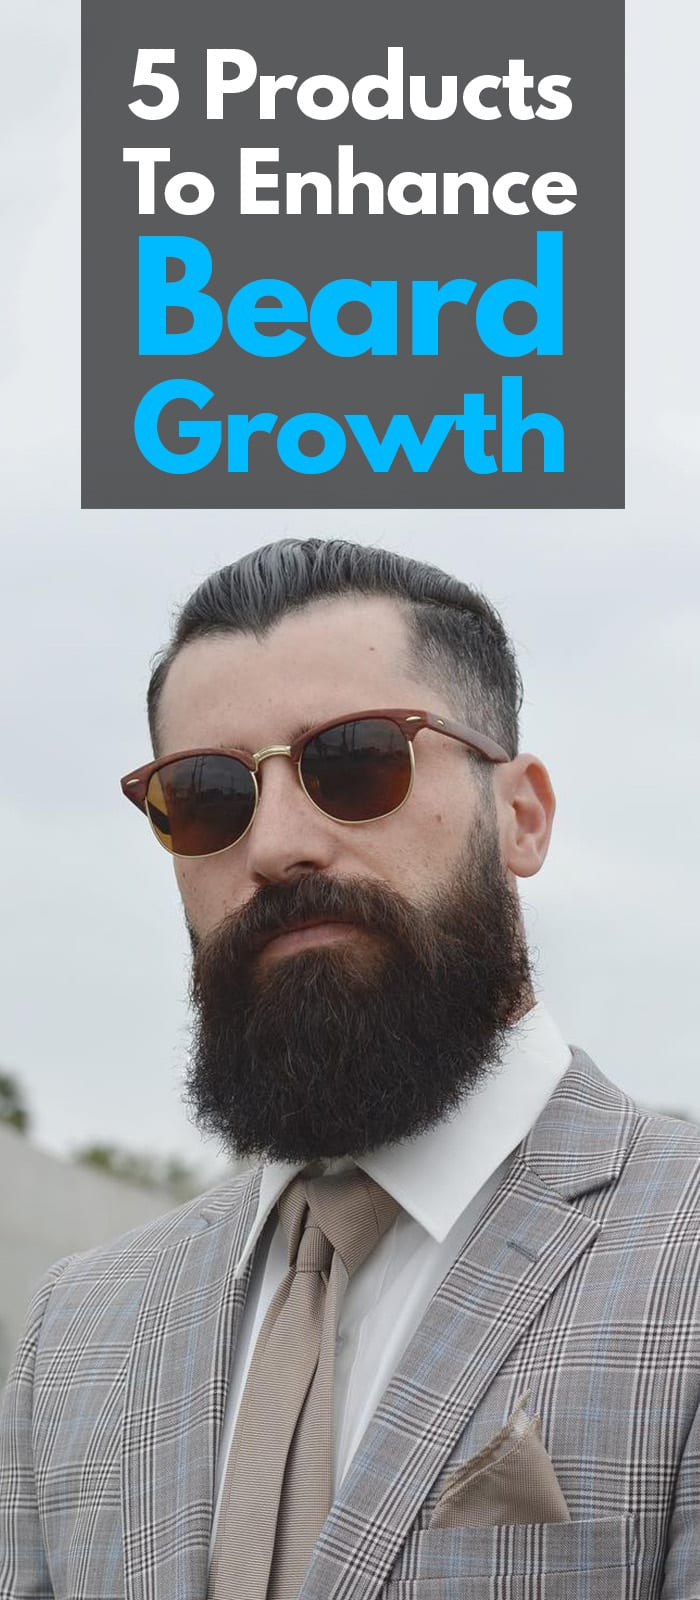 Beard Growth For Men!